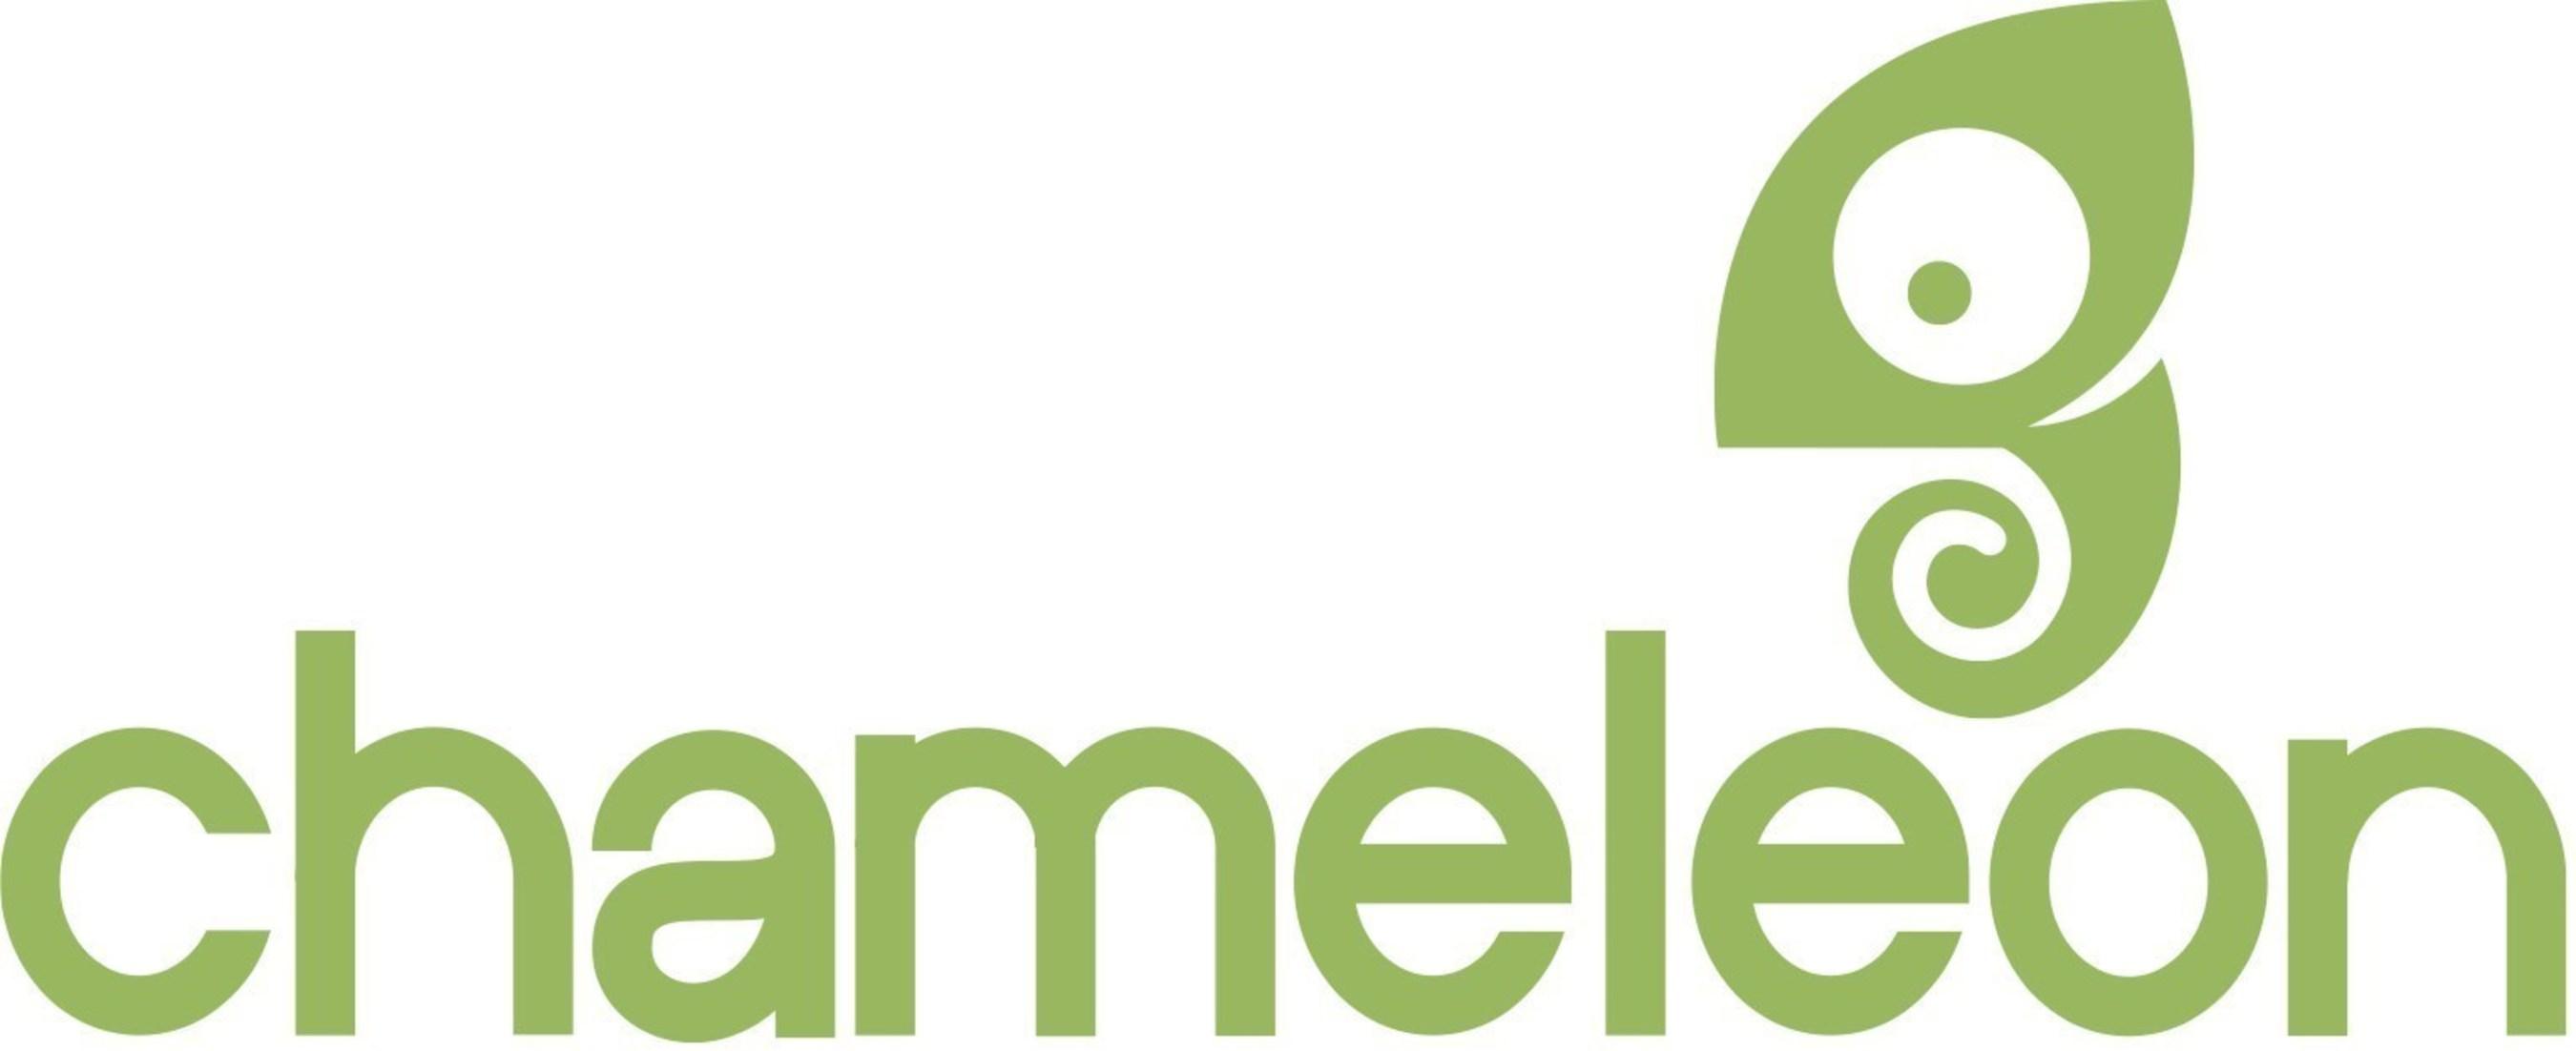 Chameleon, a Platform for Intelligent User Onboarding, Raises 1.9 Million From True Ventures